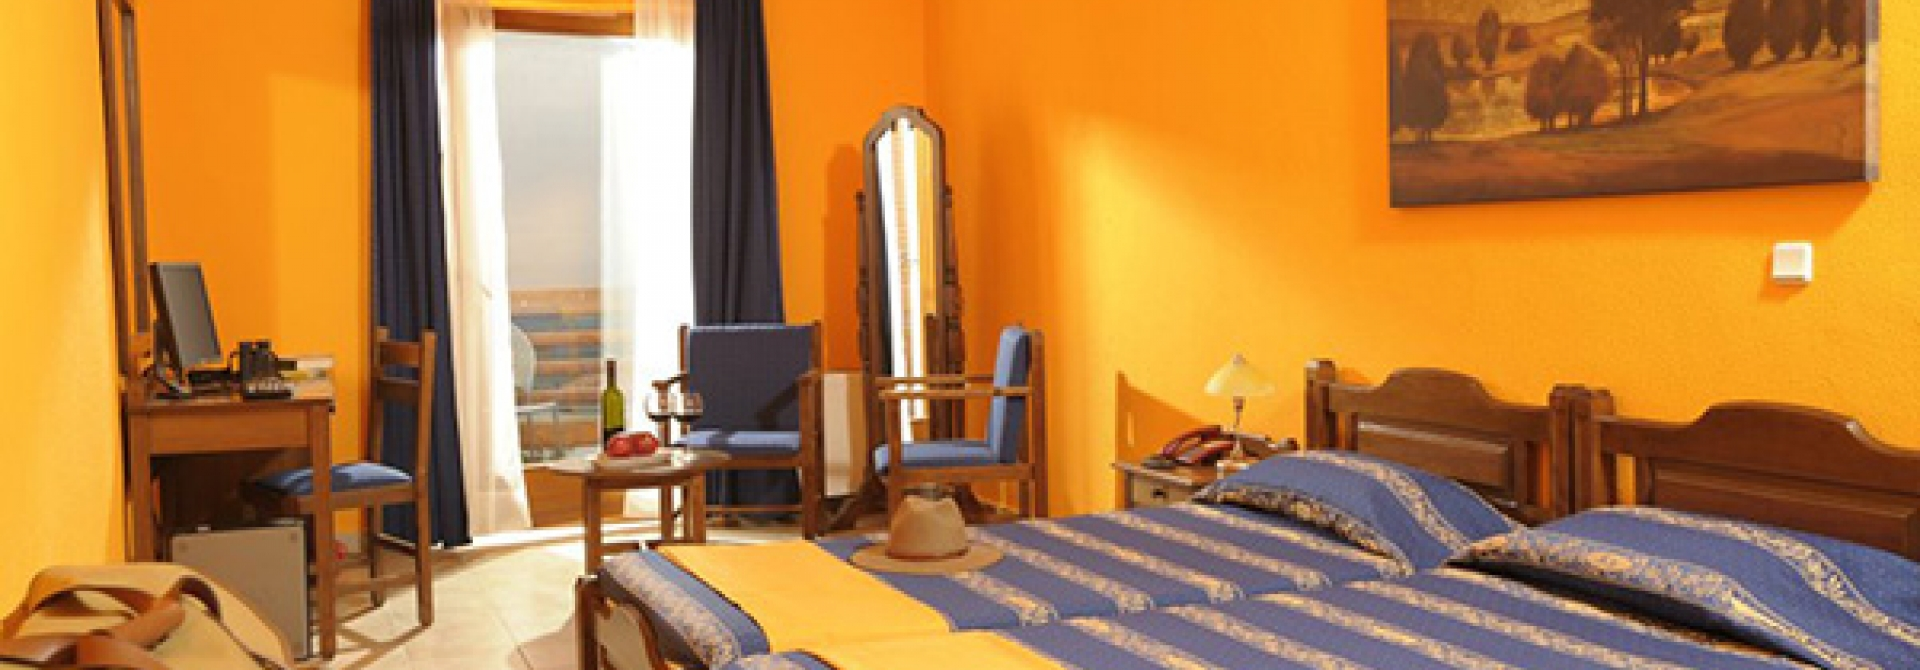 Почивка в FilosXenia Roxani Country House Hotel, Халкидики, на цена от 27.10 лв.